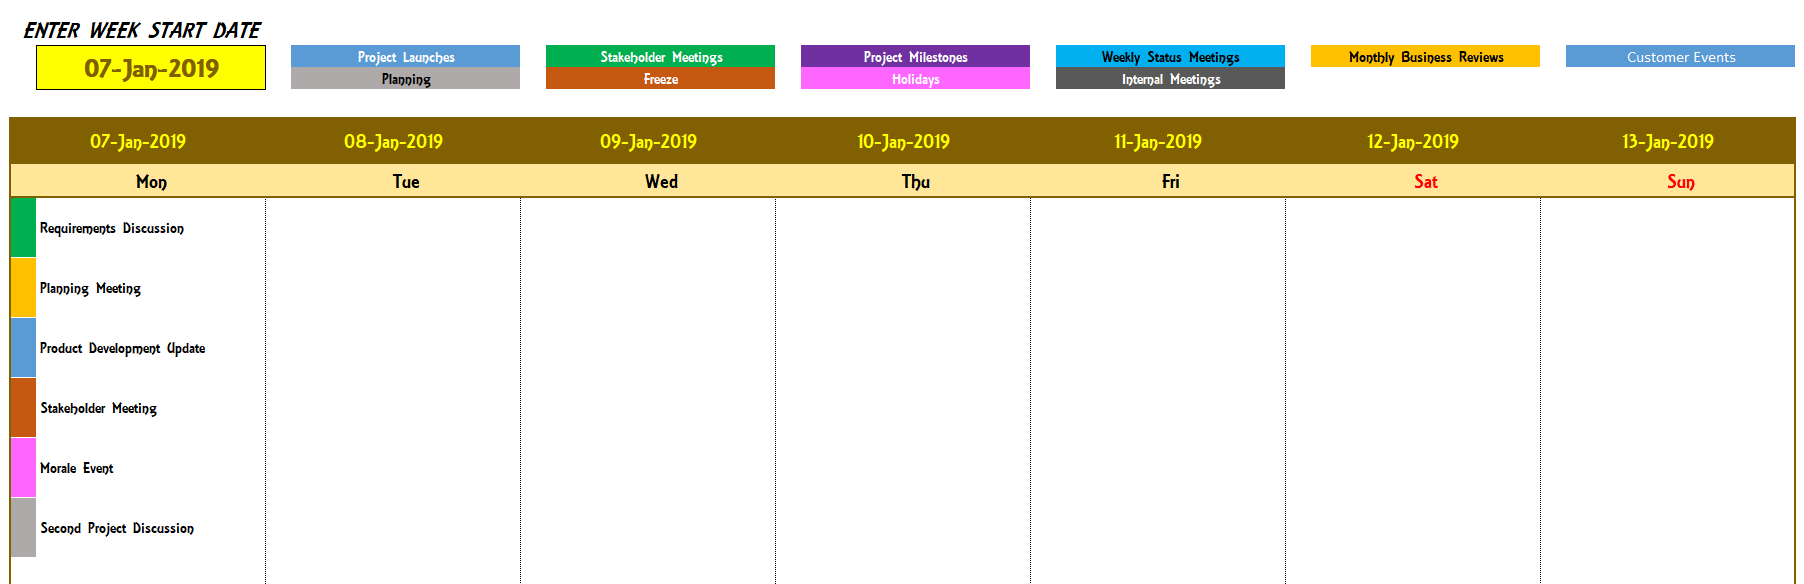 Excel Calendar Template - Excel Calendar 2019, 2020 Or Any Year with regard to Excel Calendar Template Weekly